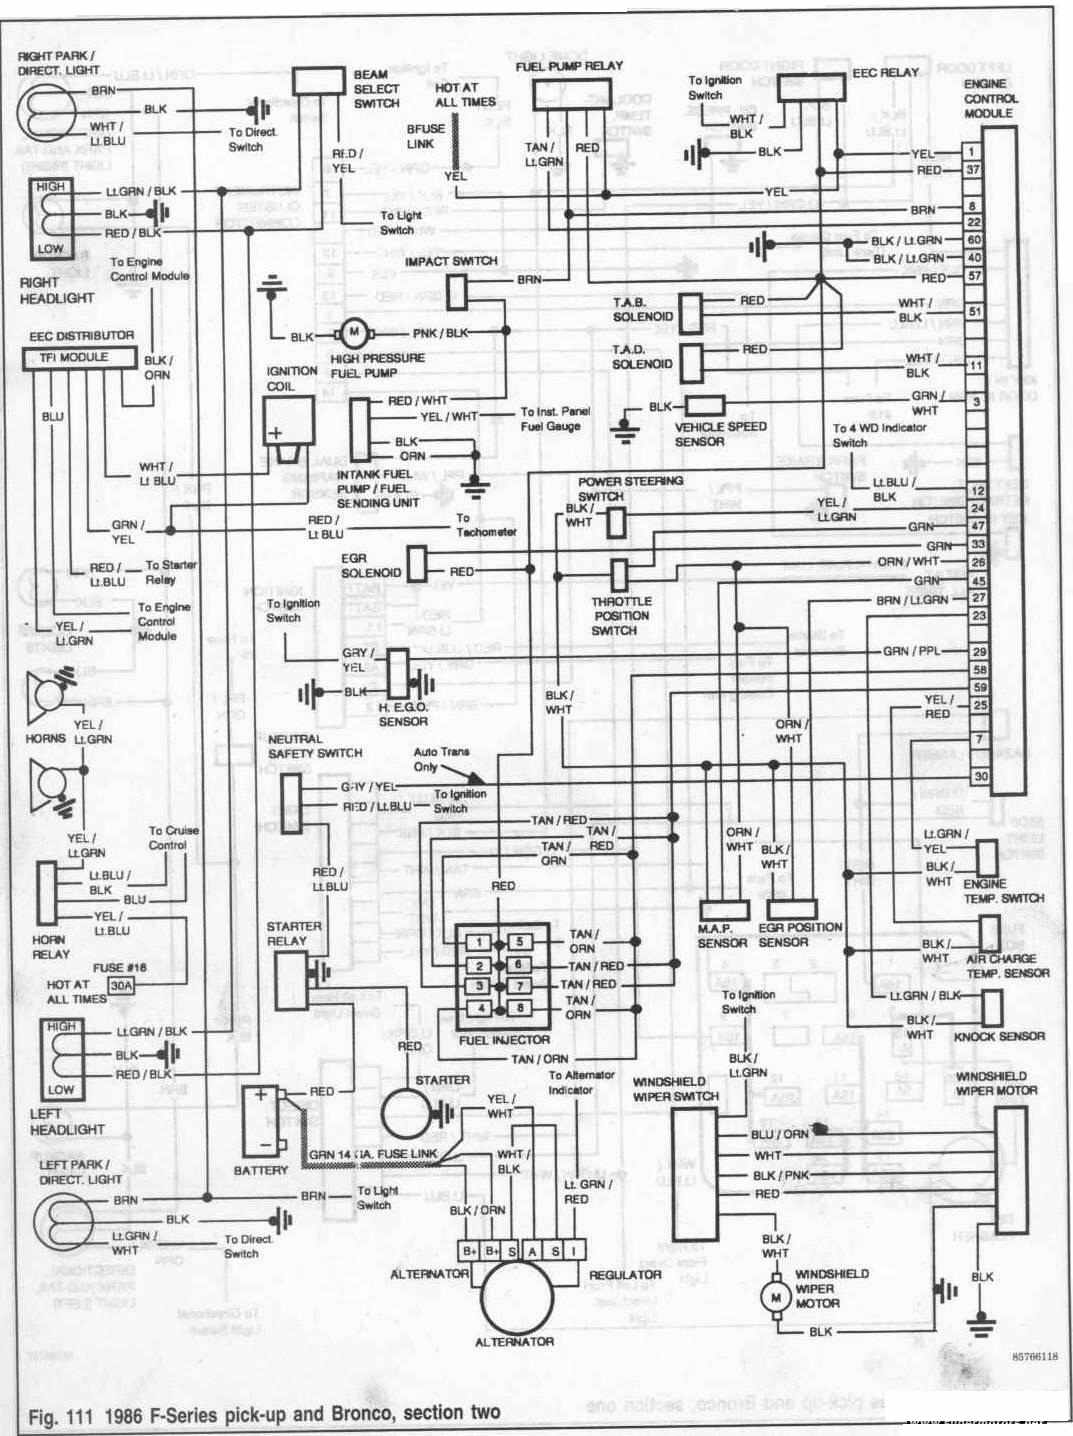 Swell 1990 Ford 460 Engine Diagram Diagram Data Schema Wiring Cloud Icalpermsplehendilmohammedshrineorg